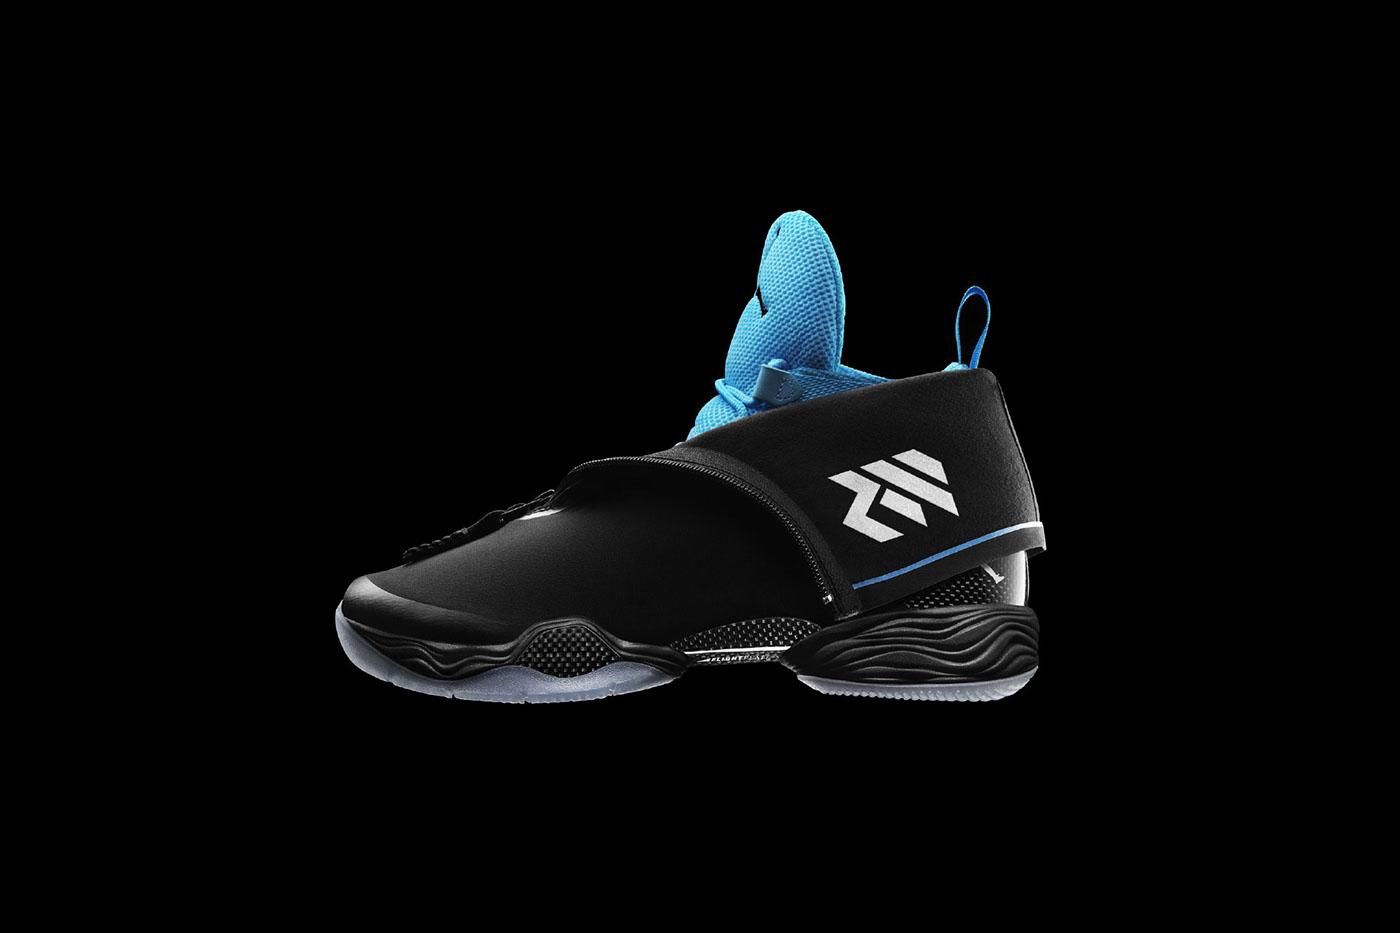 Nike basketball jordan russell Westbrook logo identity NBA